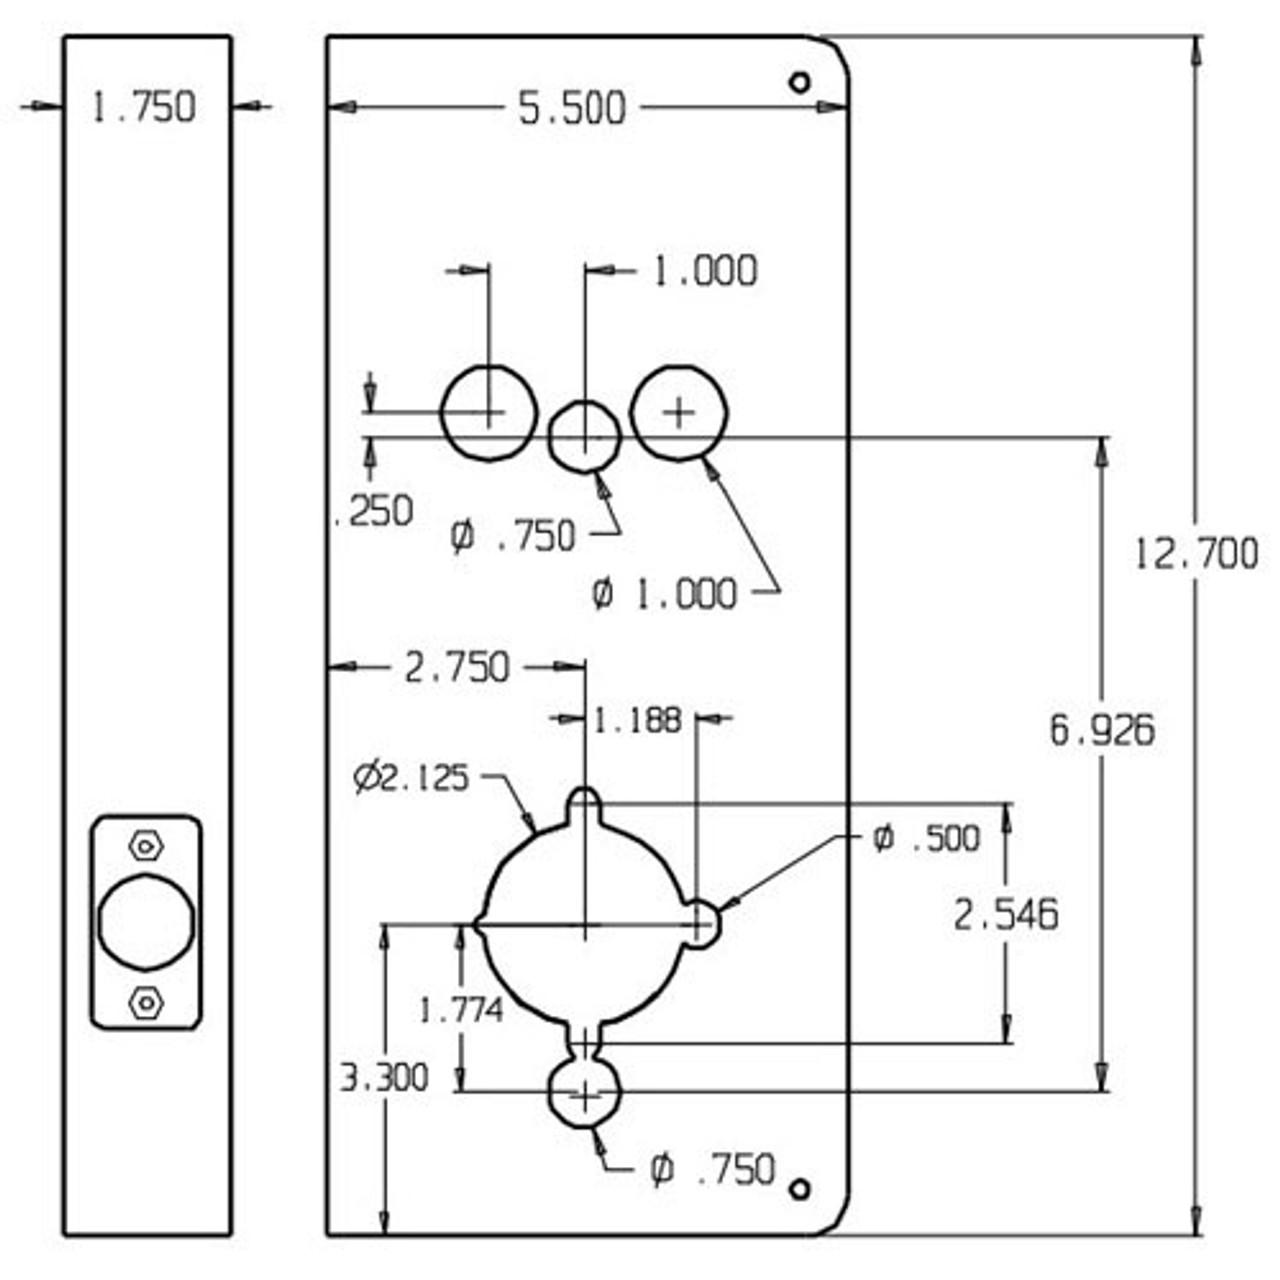 93-KV-10B-CW Don Jo Wrap-Around Plate for Best 93-KV Locks and Mas-Hamilton Power Levers Dimensional View